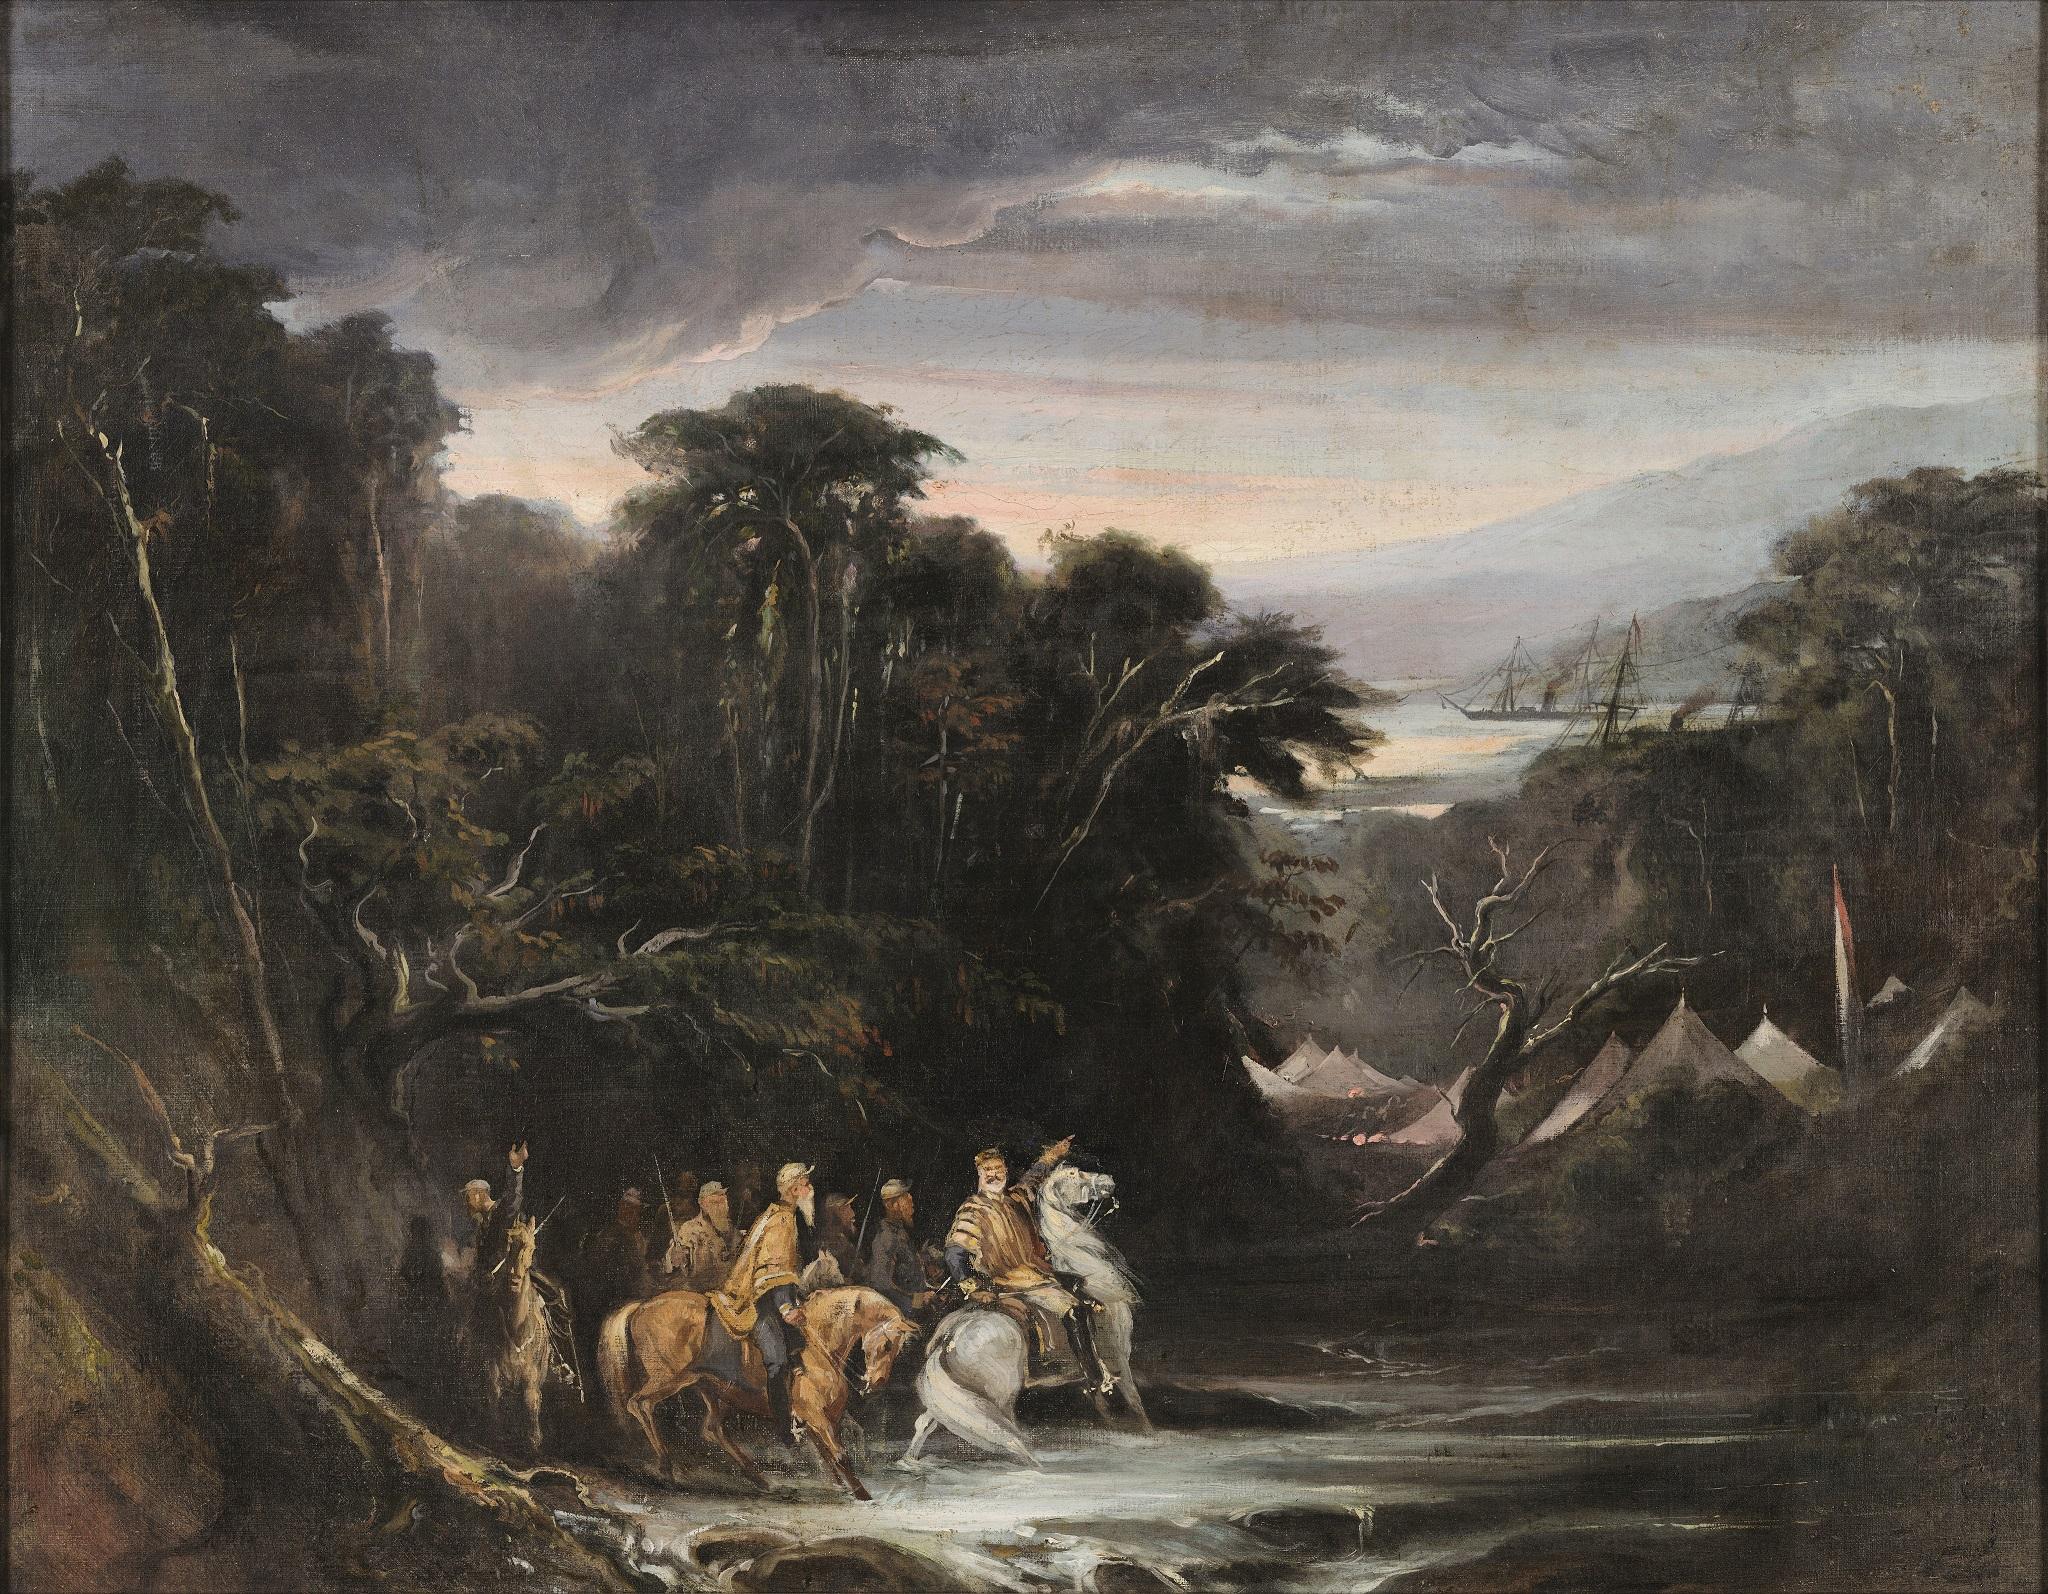 "Pinturas históricas: o estudo ""Pasagem do Chaco"" (1871) de Pedro Américo"